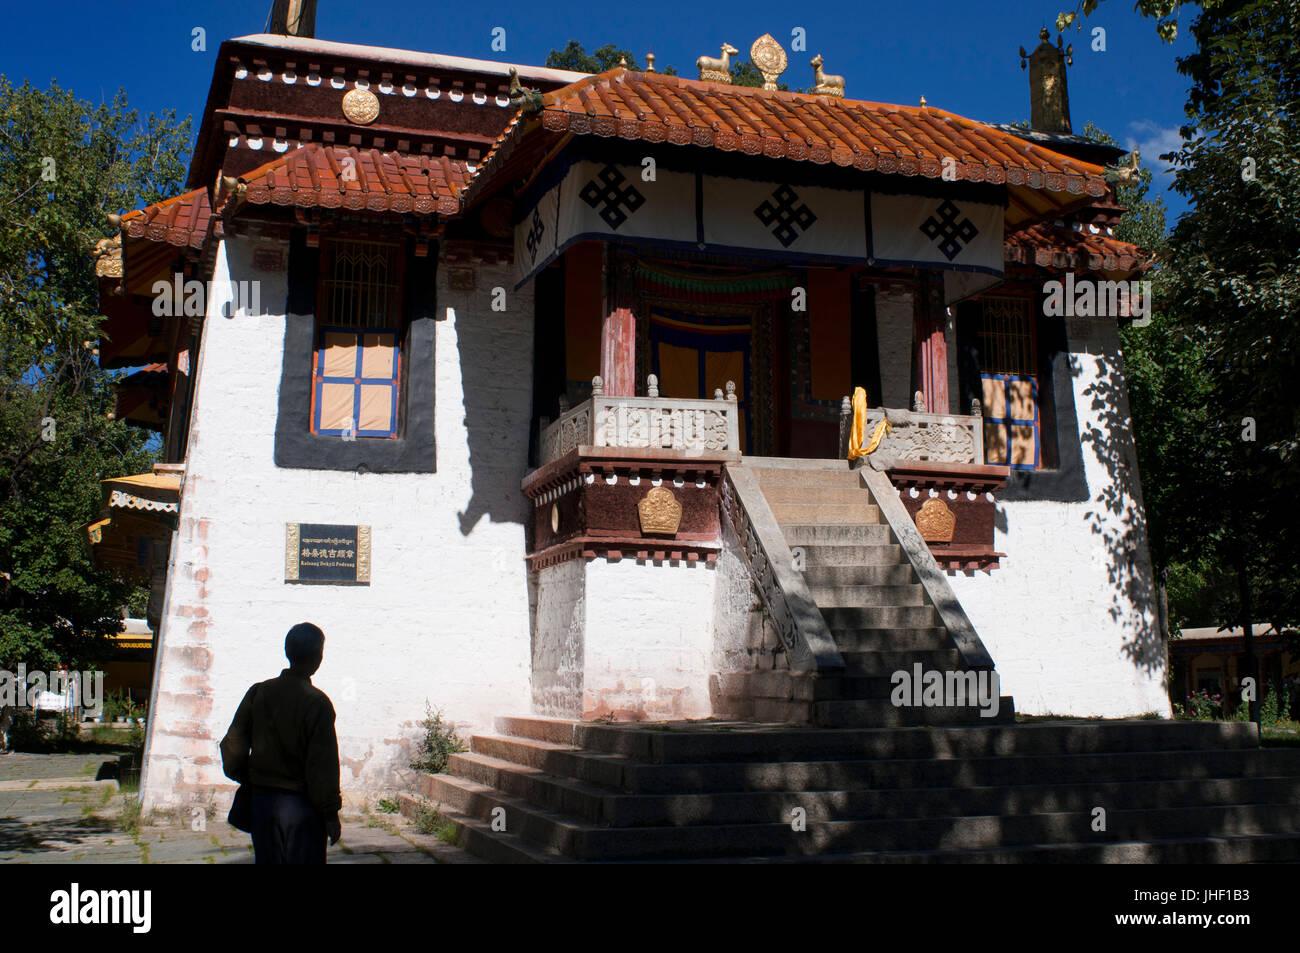 Norbulingka Palace or summer palace, Lhasa, Tibet (Xizang, China). The palace served as the traditional summer residence - Stock Image